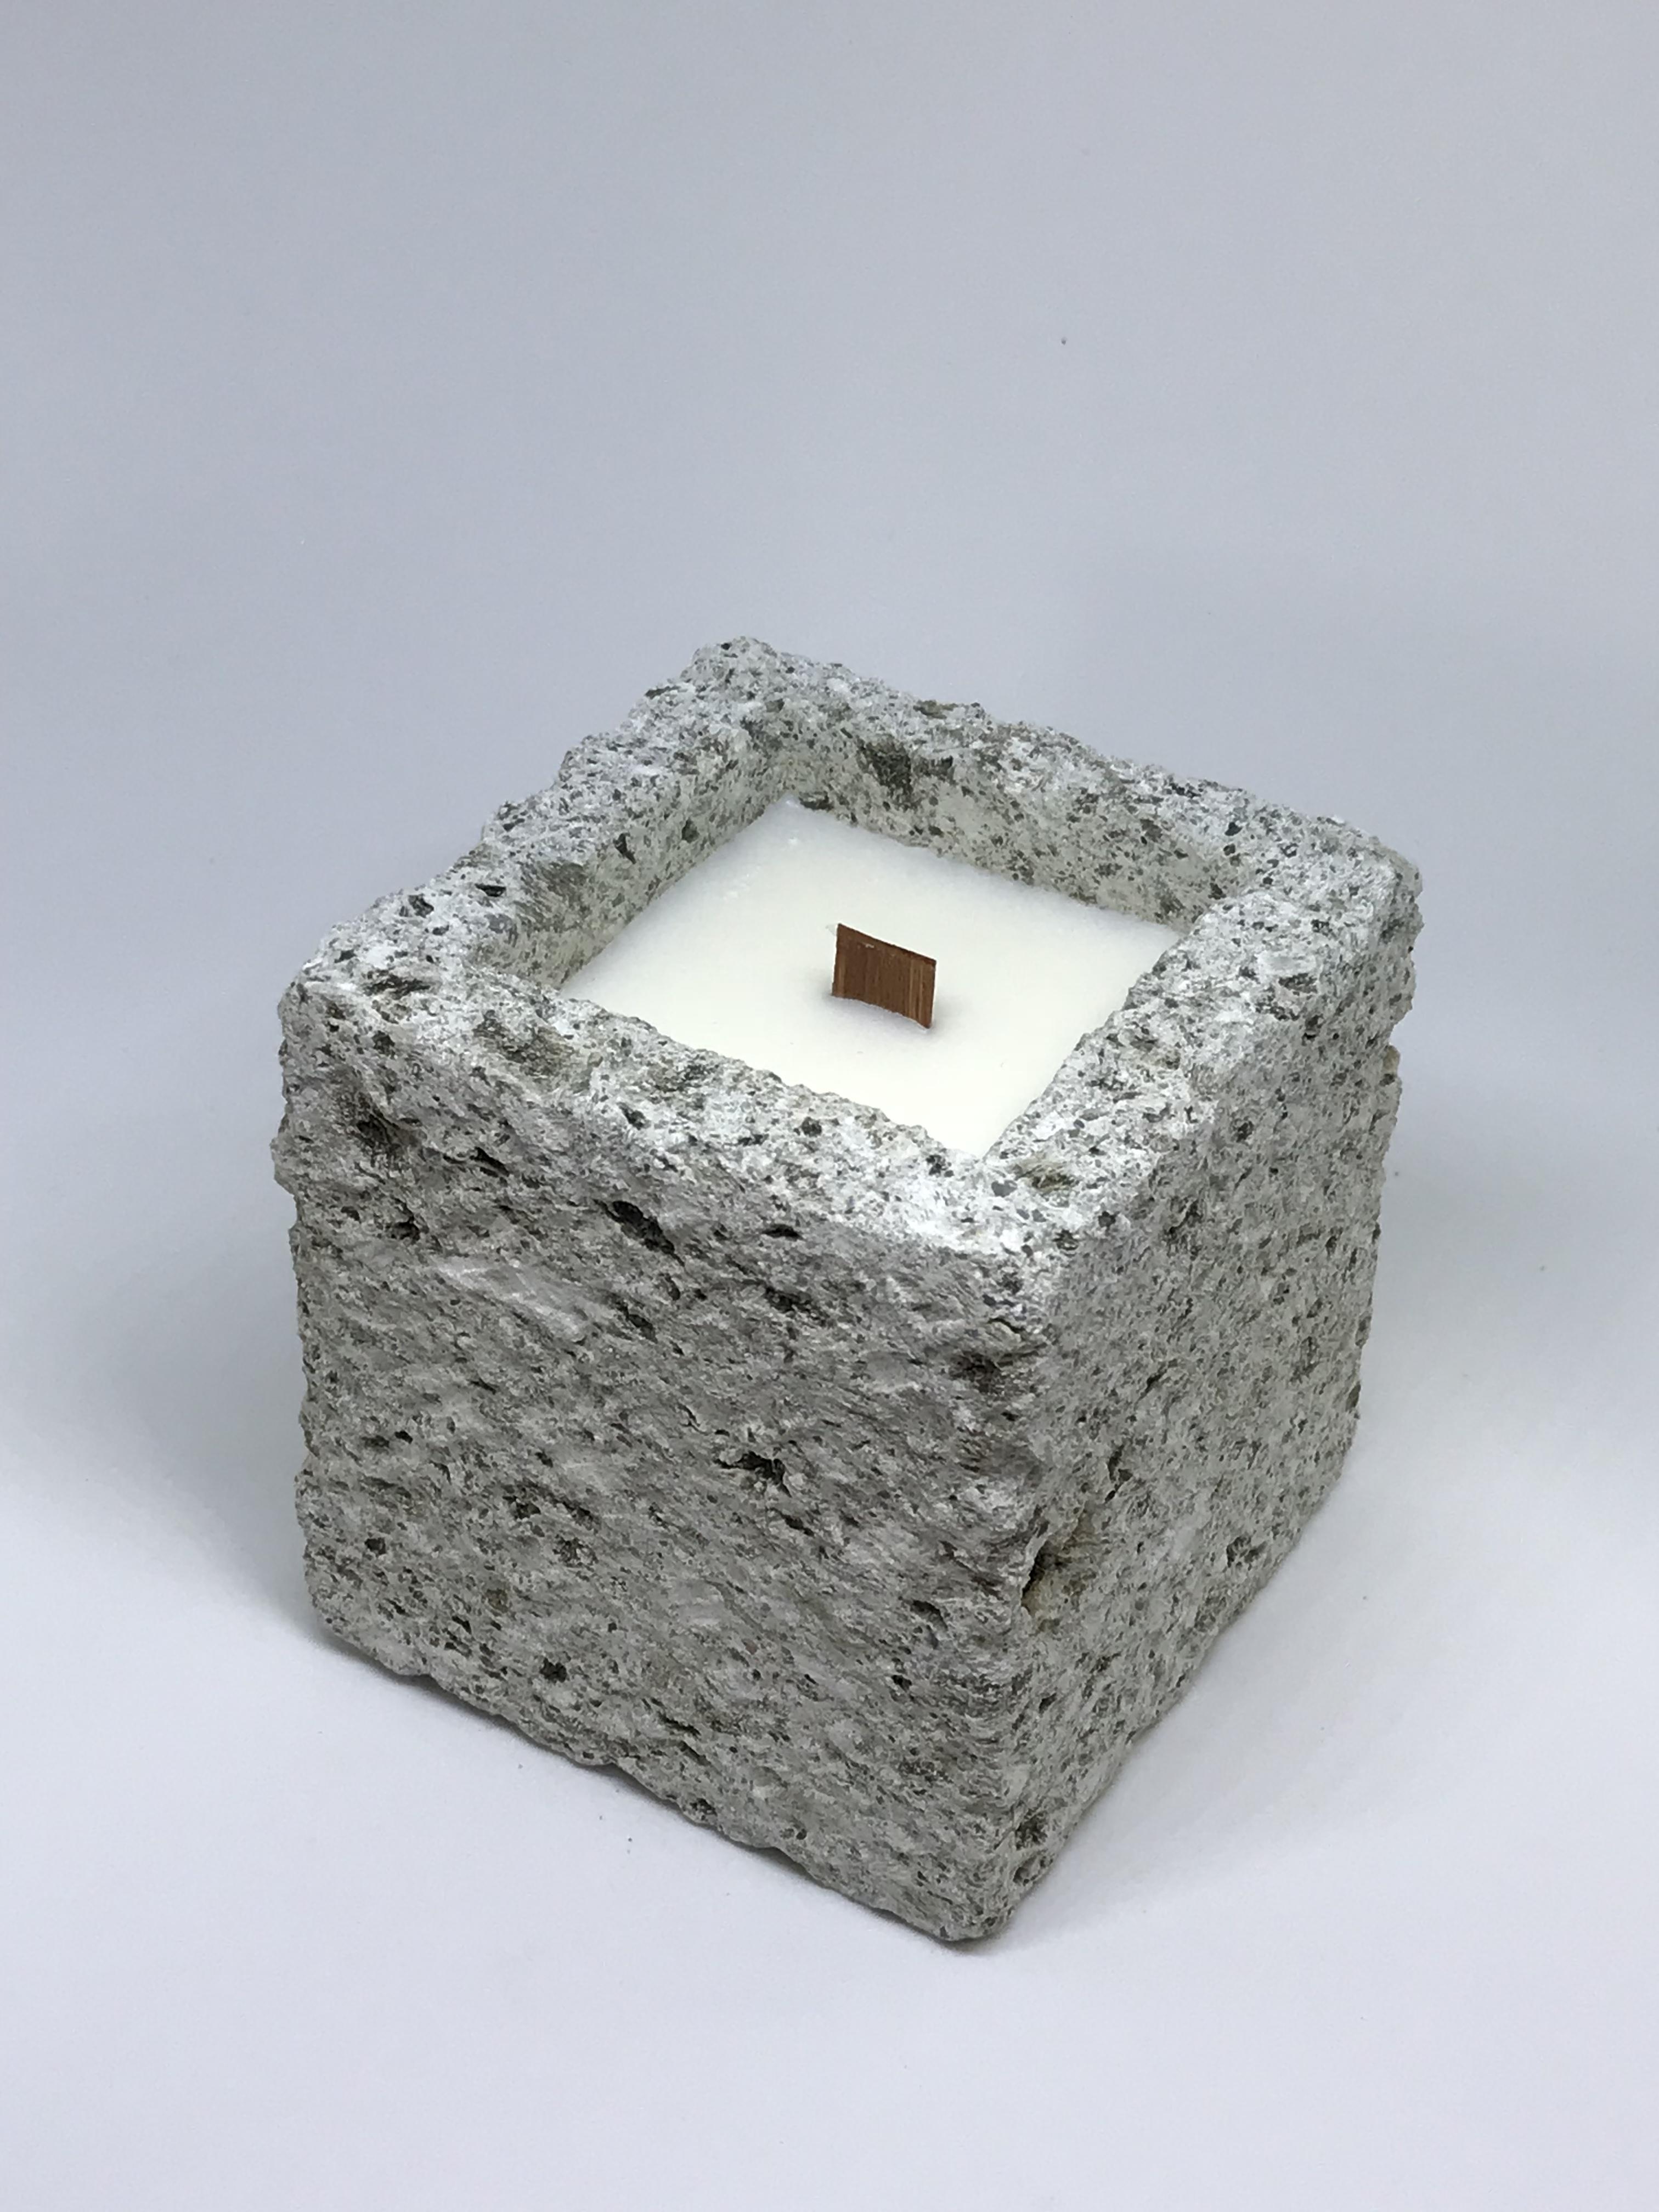 takibi〔square〕大谷石  7000